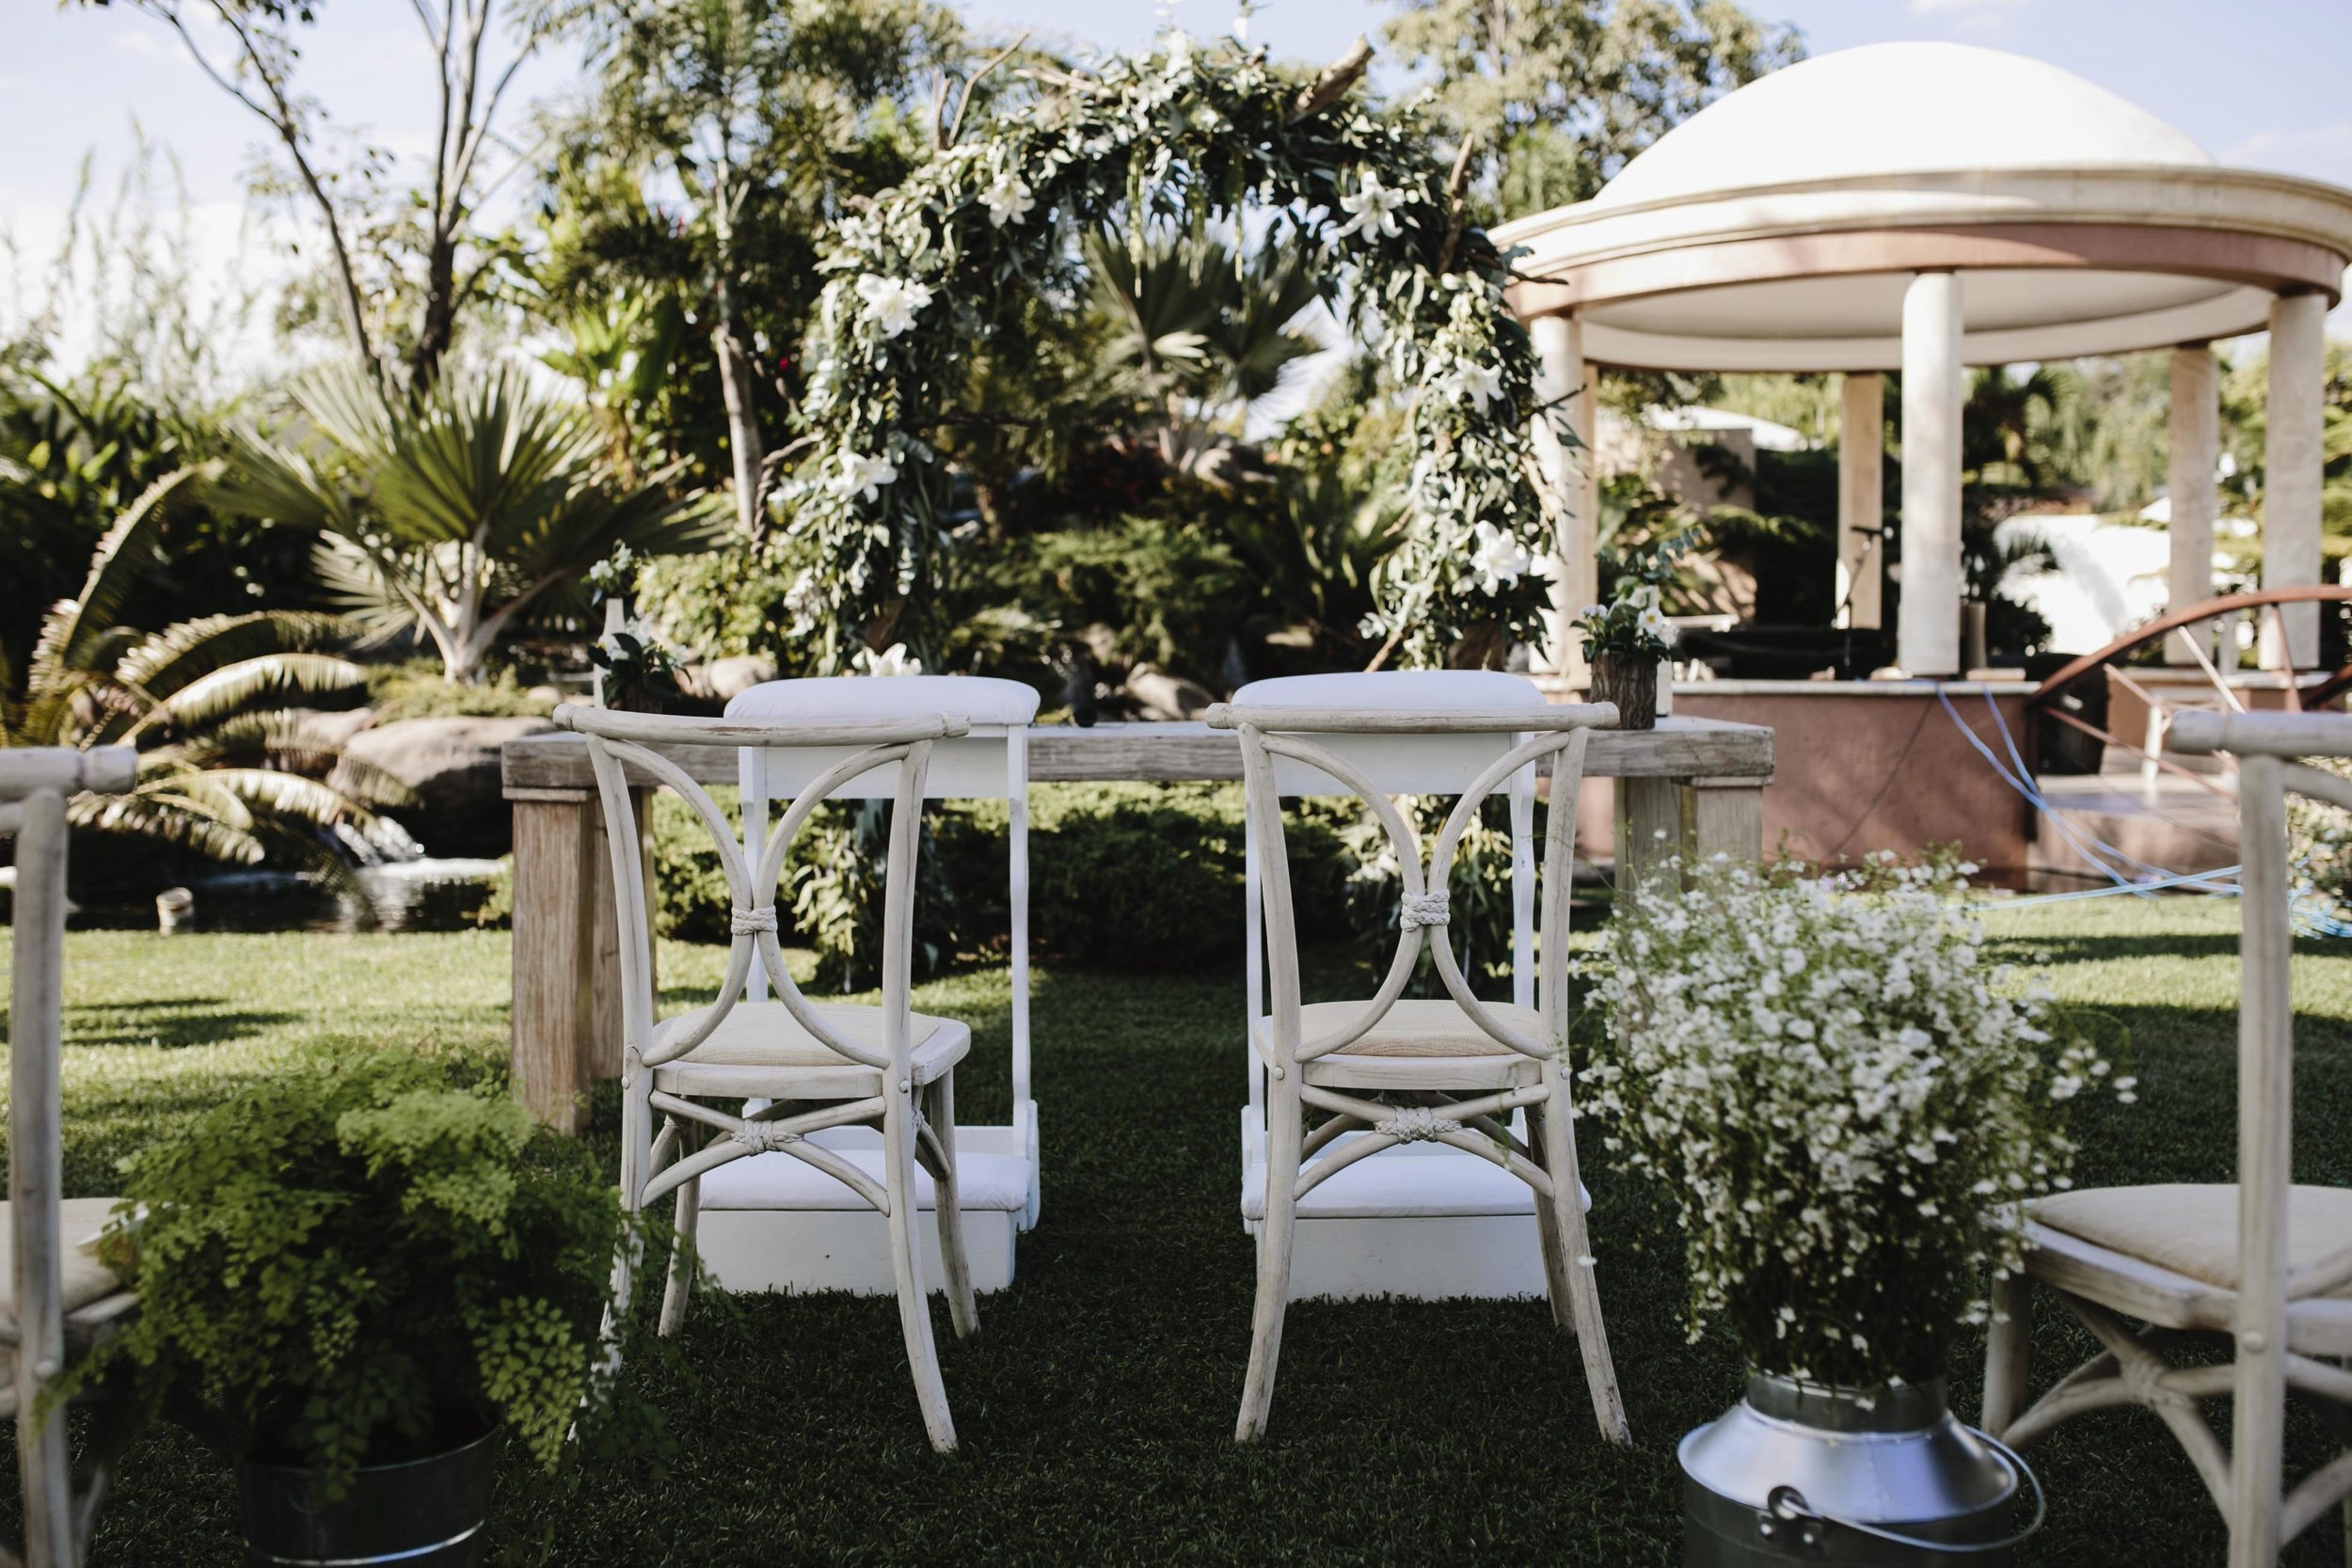 alfonso_flores_destination_wedding_photography_jardin_amarello_cuernavaca49.jpg